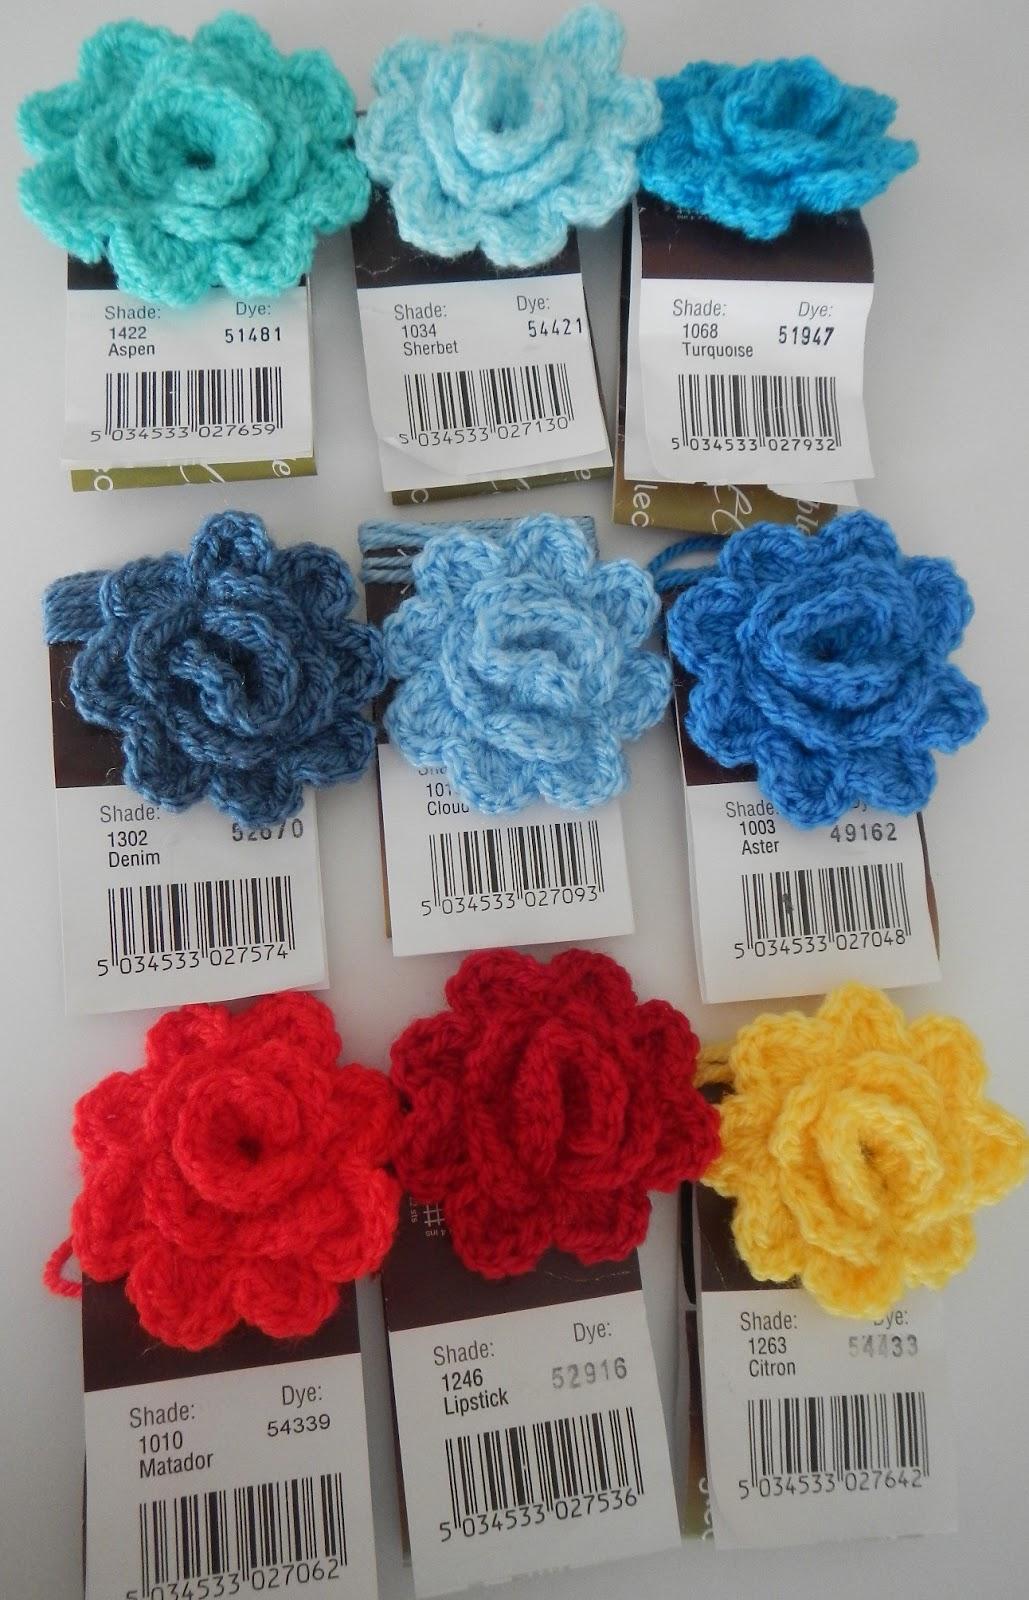 Apple Blossom Dreams: Stylecraft Special DK Color Combos 1 of 5